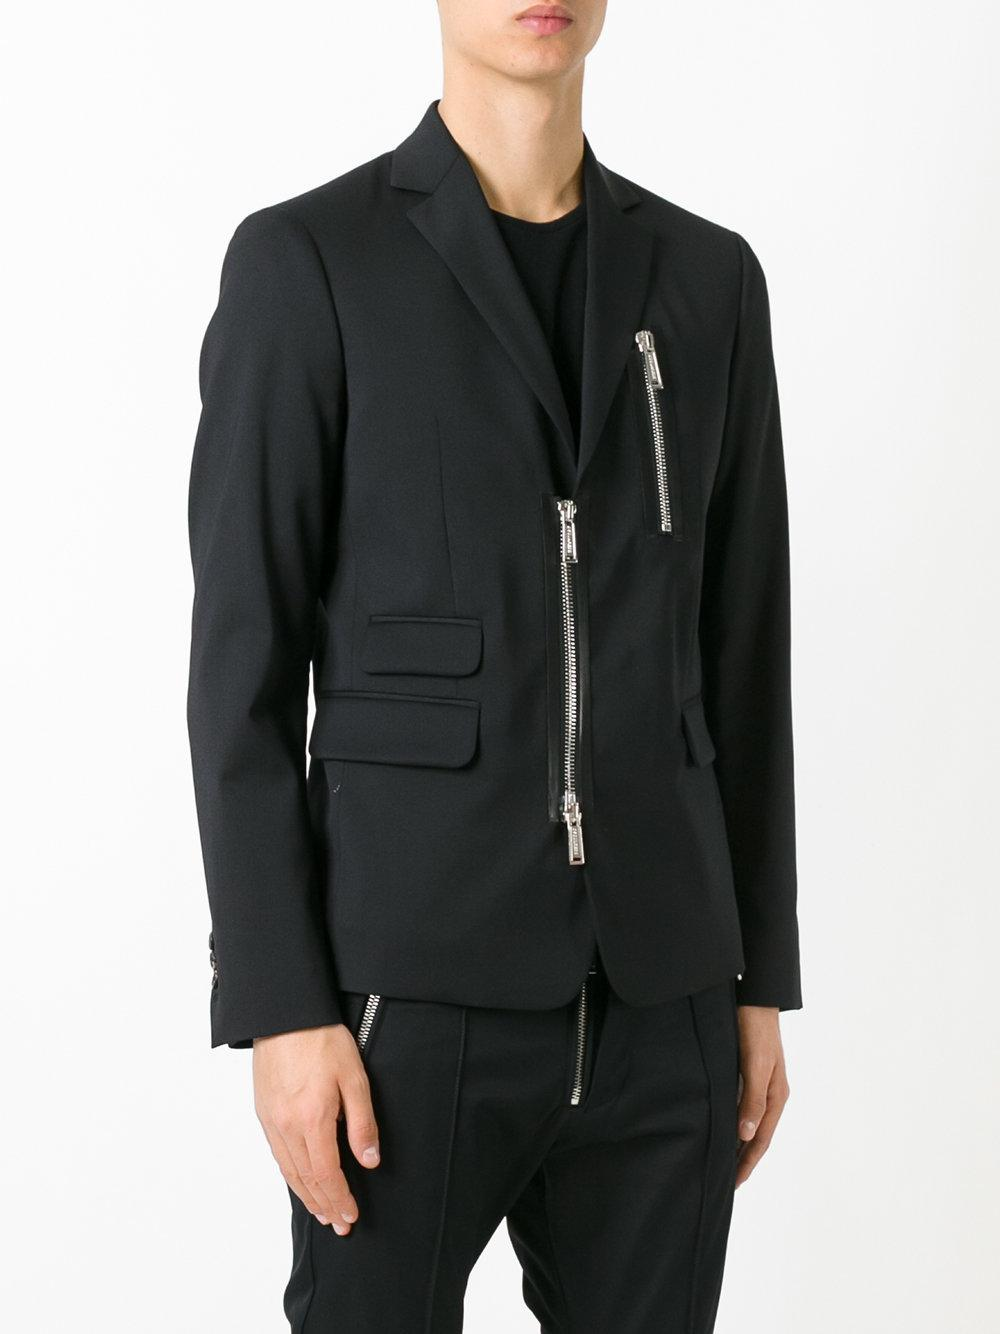 DSquared² Wool Zipped Blazer in Black for Men